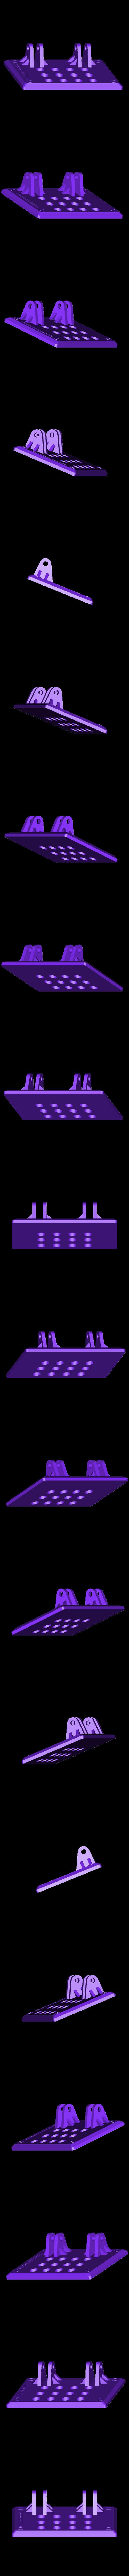 lcd_tablet_mount.stl Download free STL file FPV kit for Turnigy 9XR • 3D print model, 3dxl